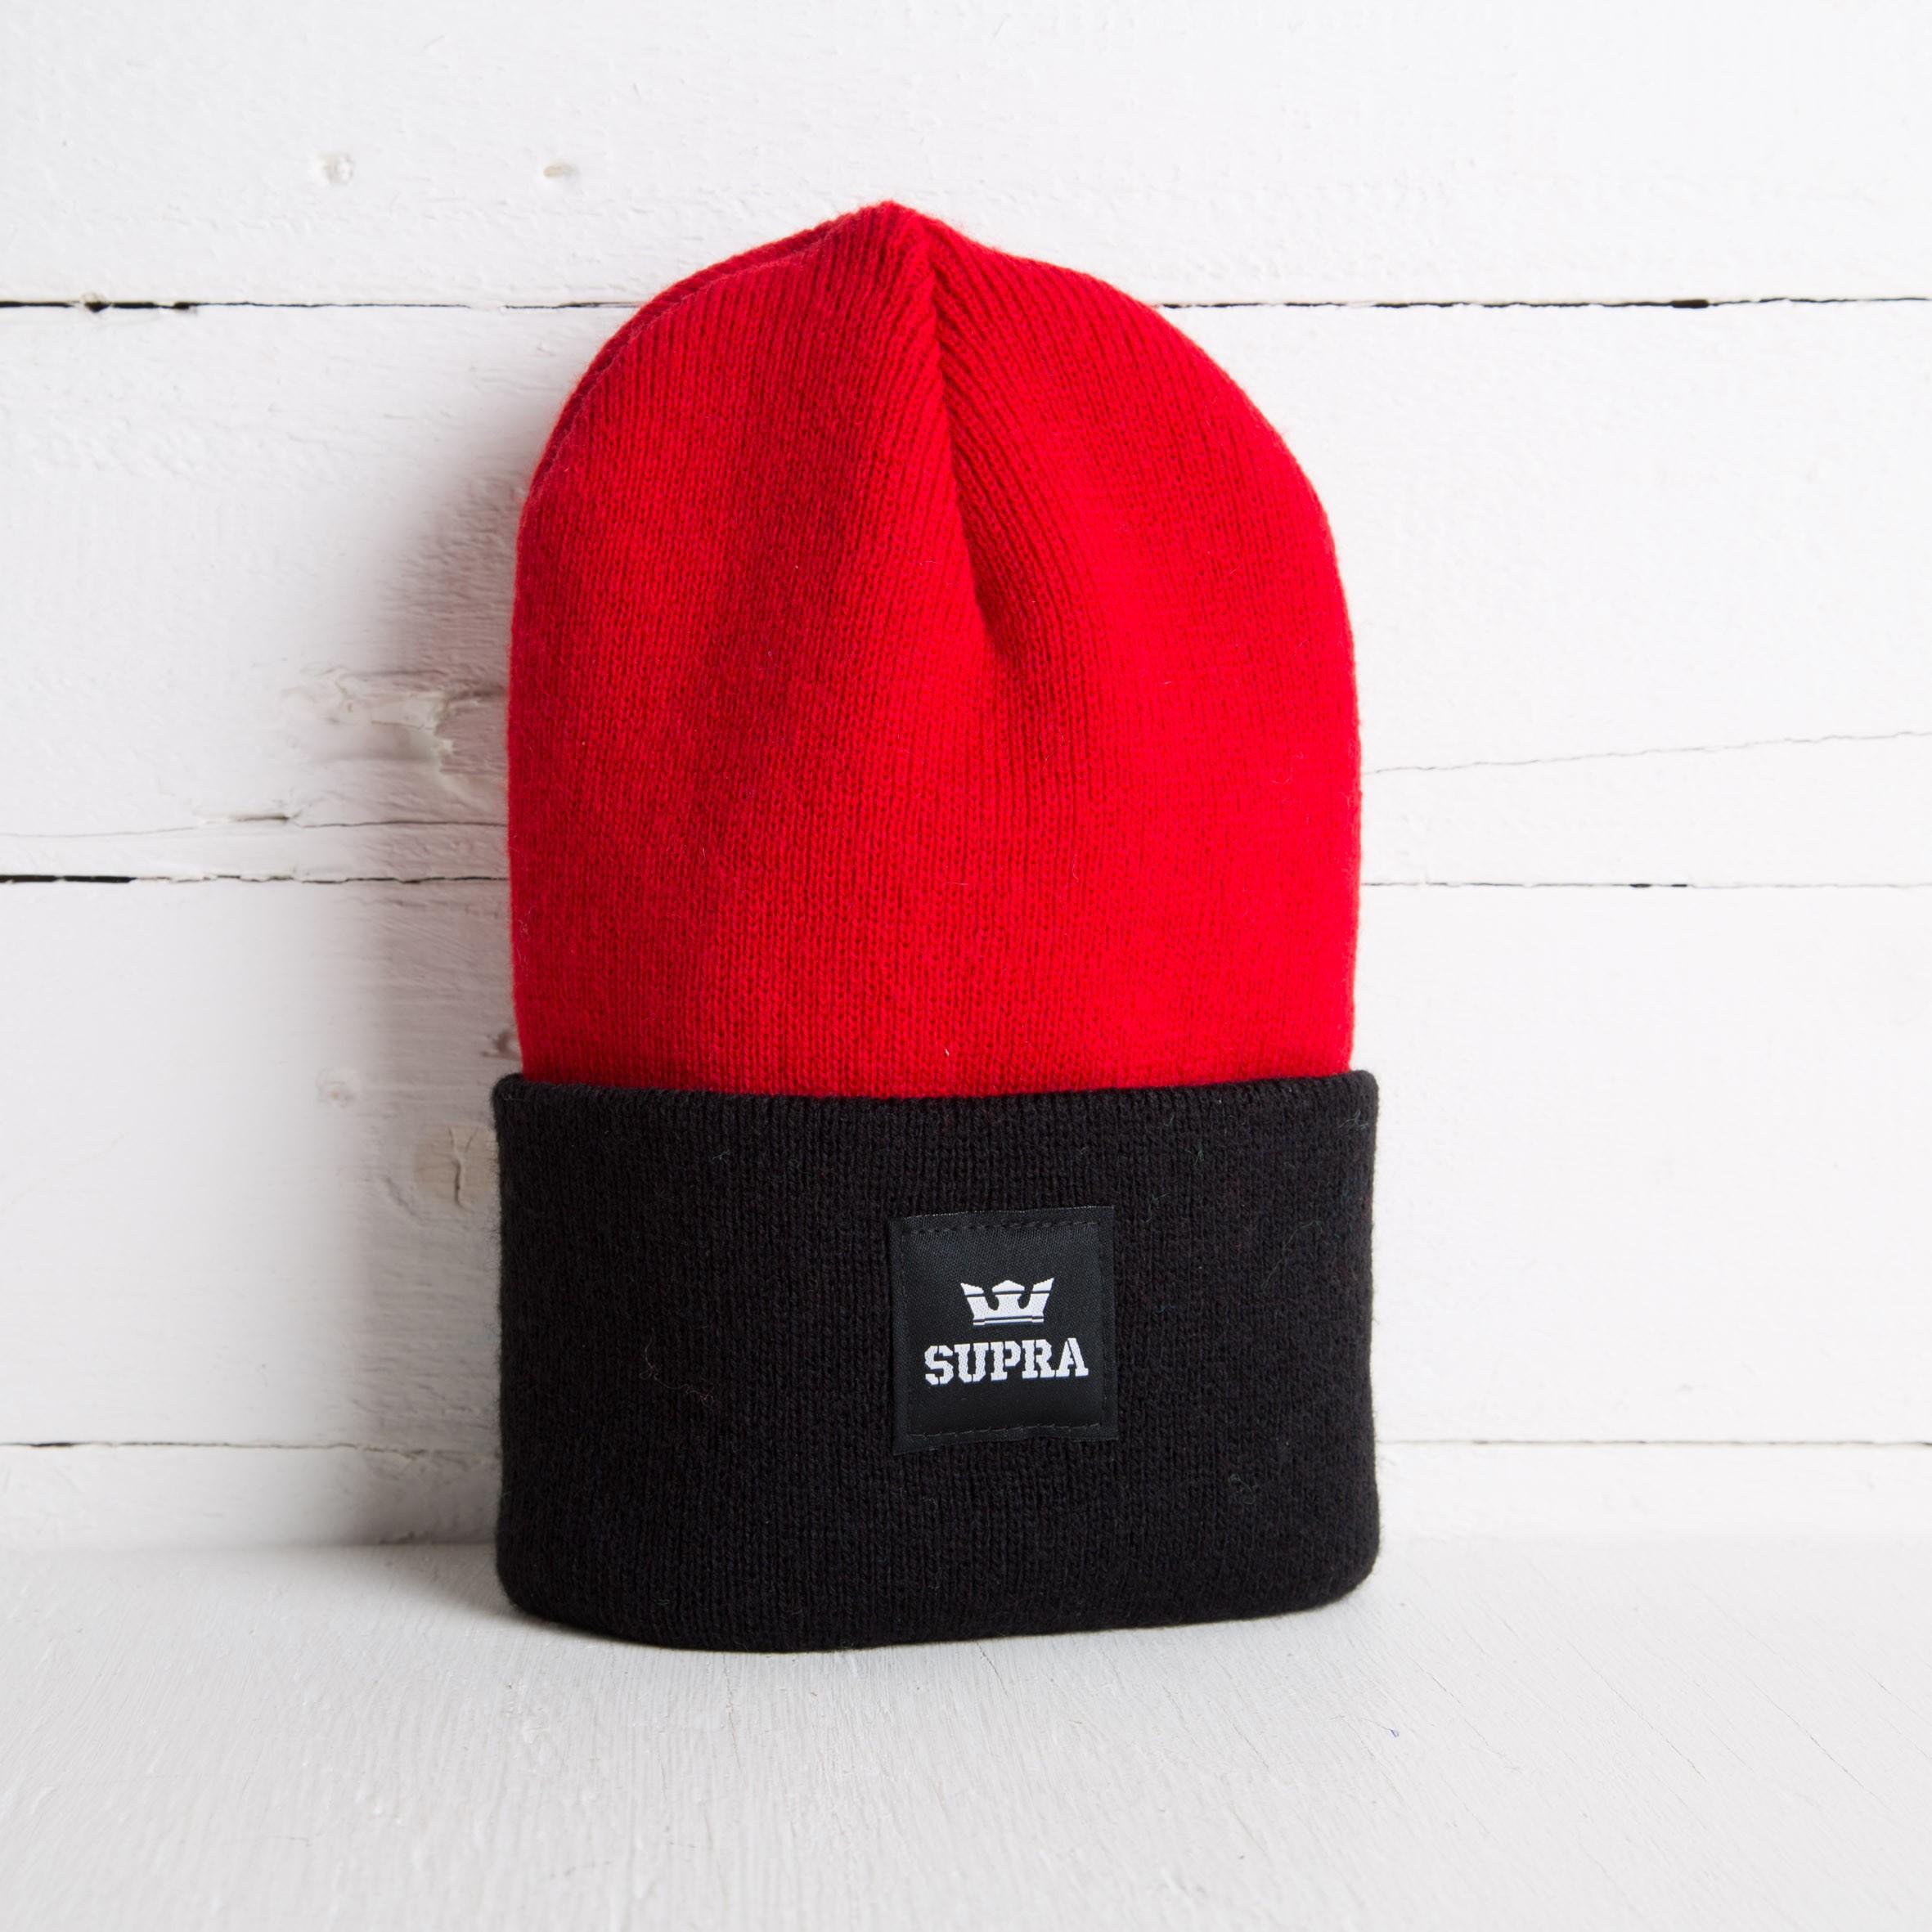 Supra Watts Beanie Red  Black  86200dec8146